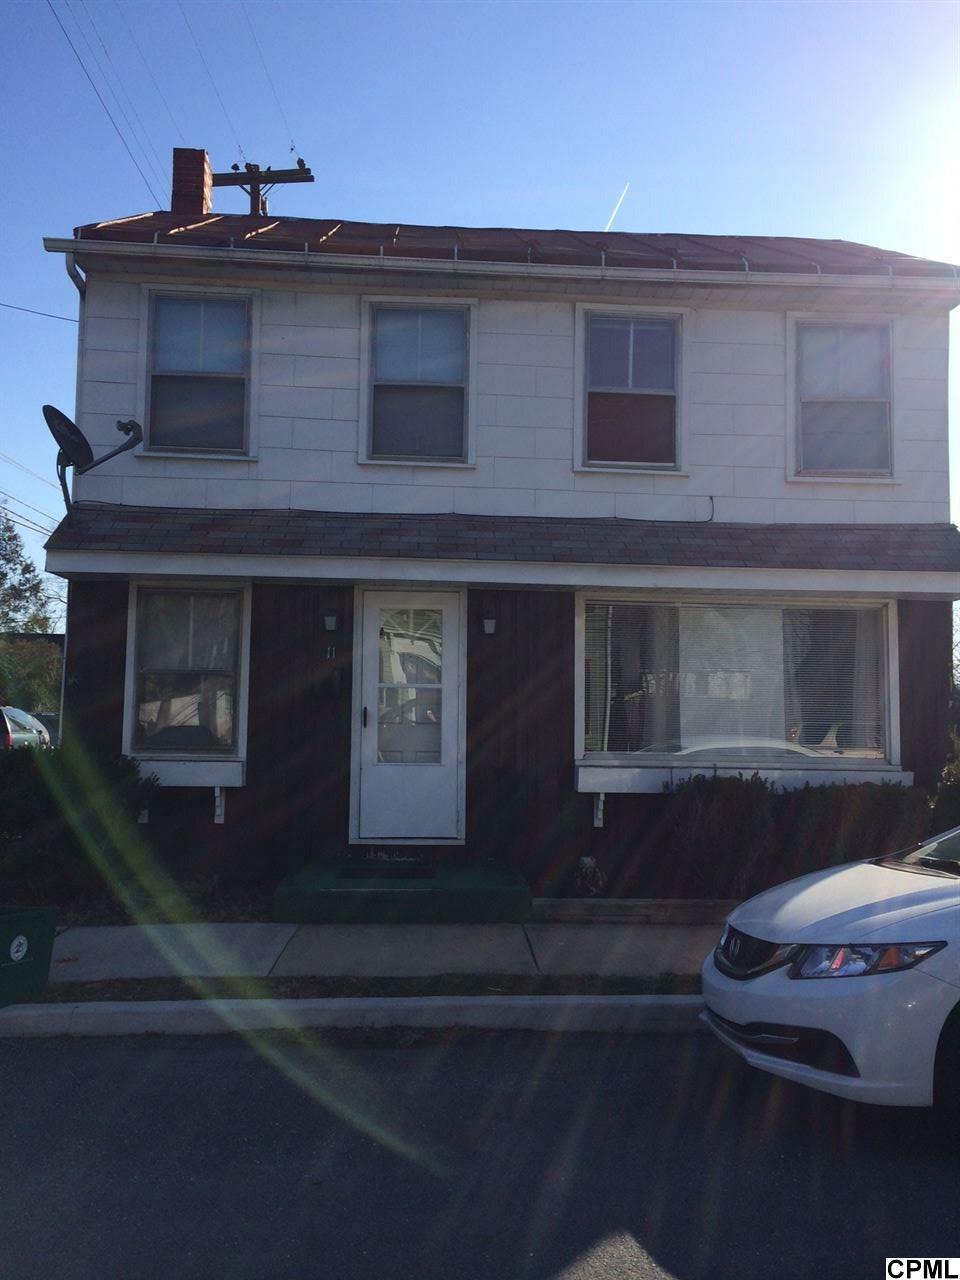 Real Estate for Sale, ListingId: 32543996, Mechanicsburg,PA17055